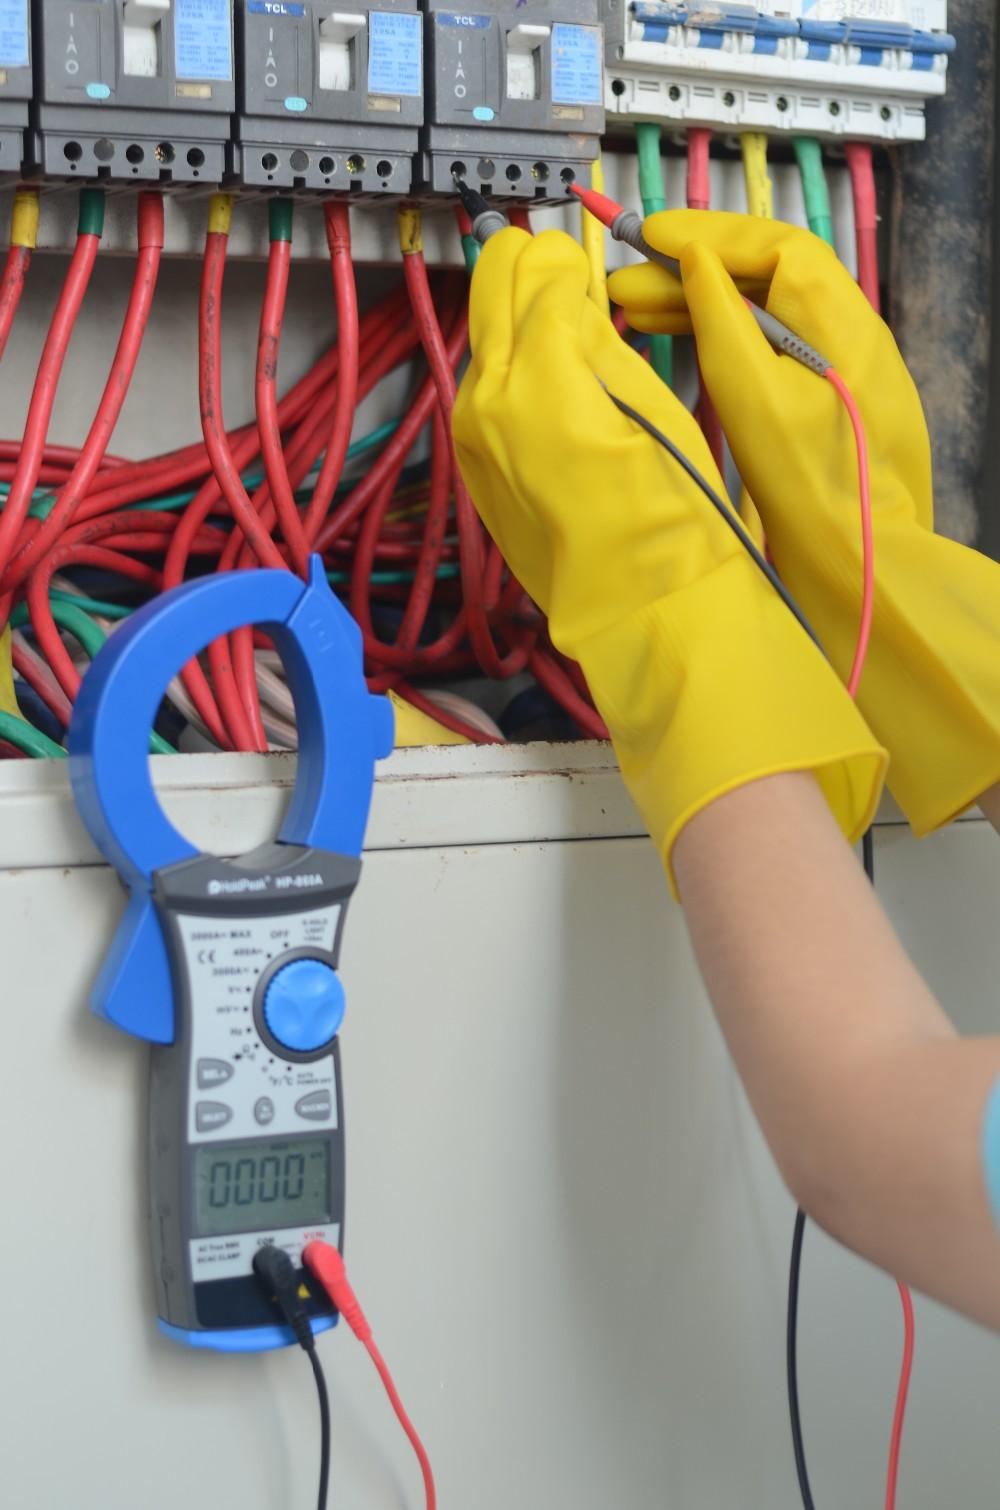 product-digital clamp multimeter ,clamp meter for digital HP-860A-HoldPeak-img